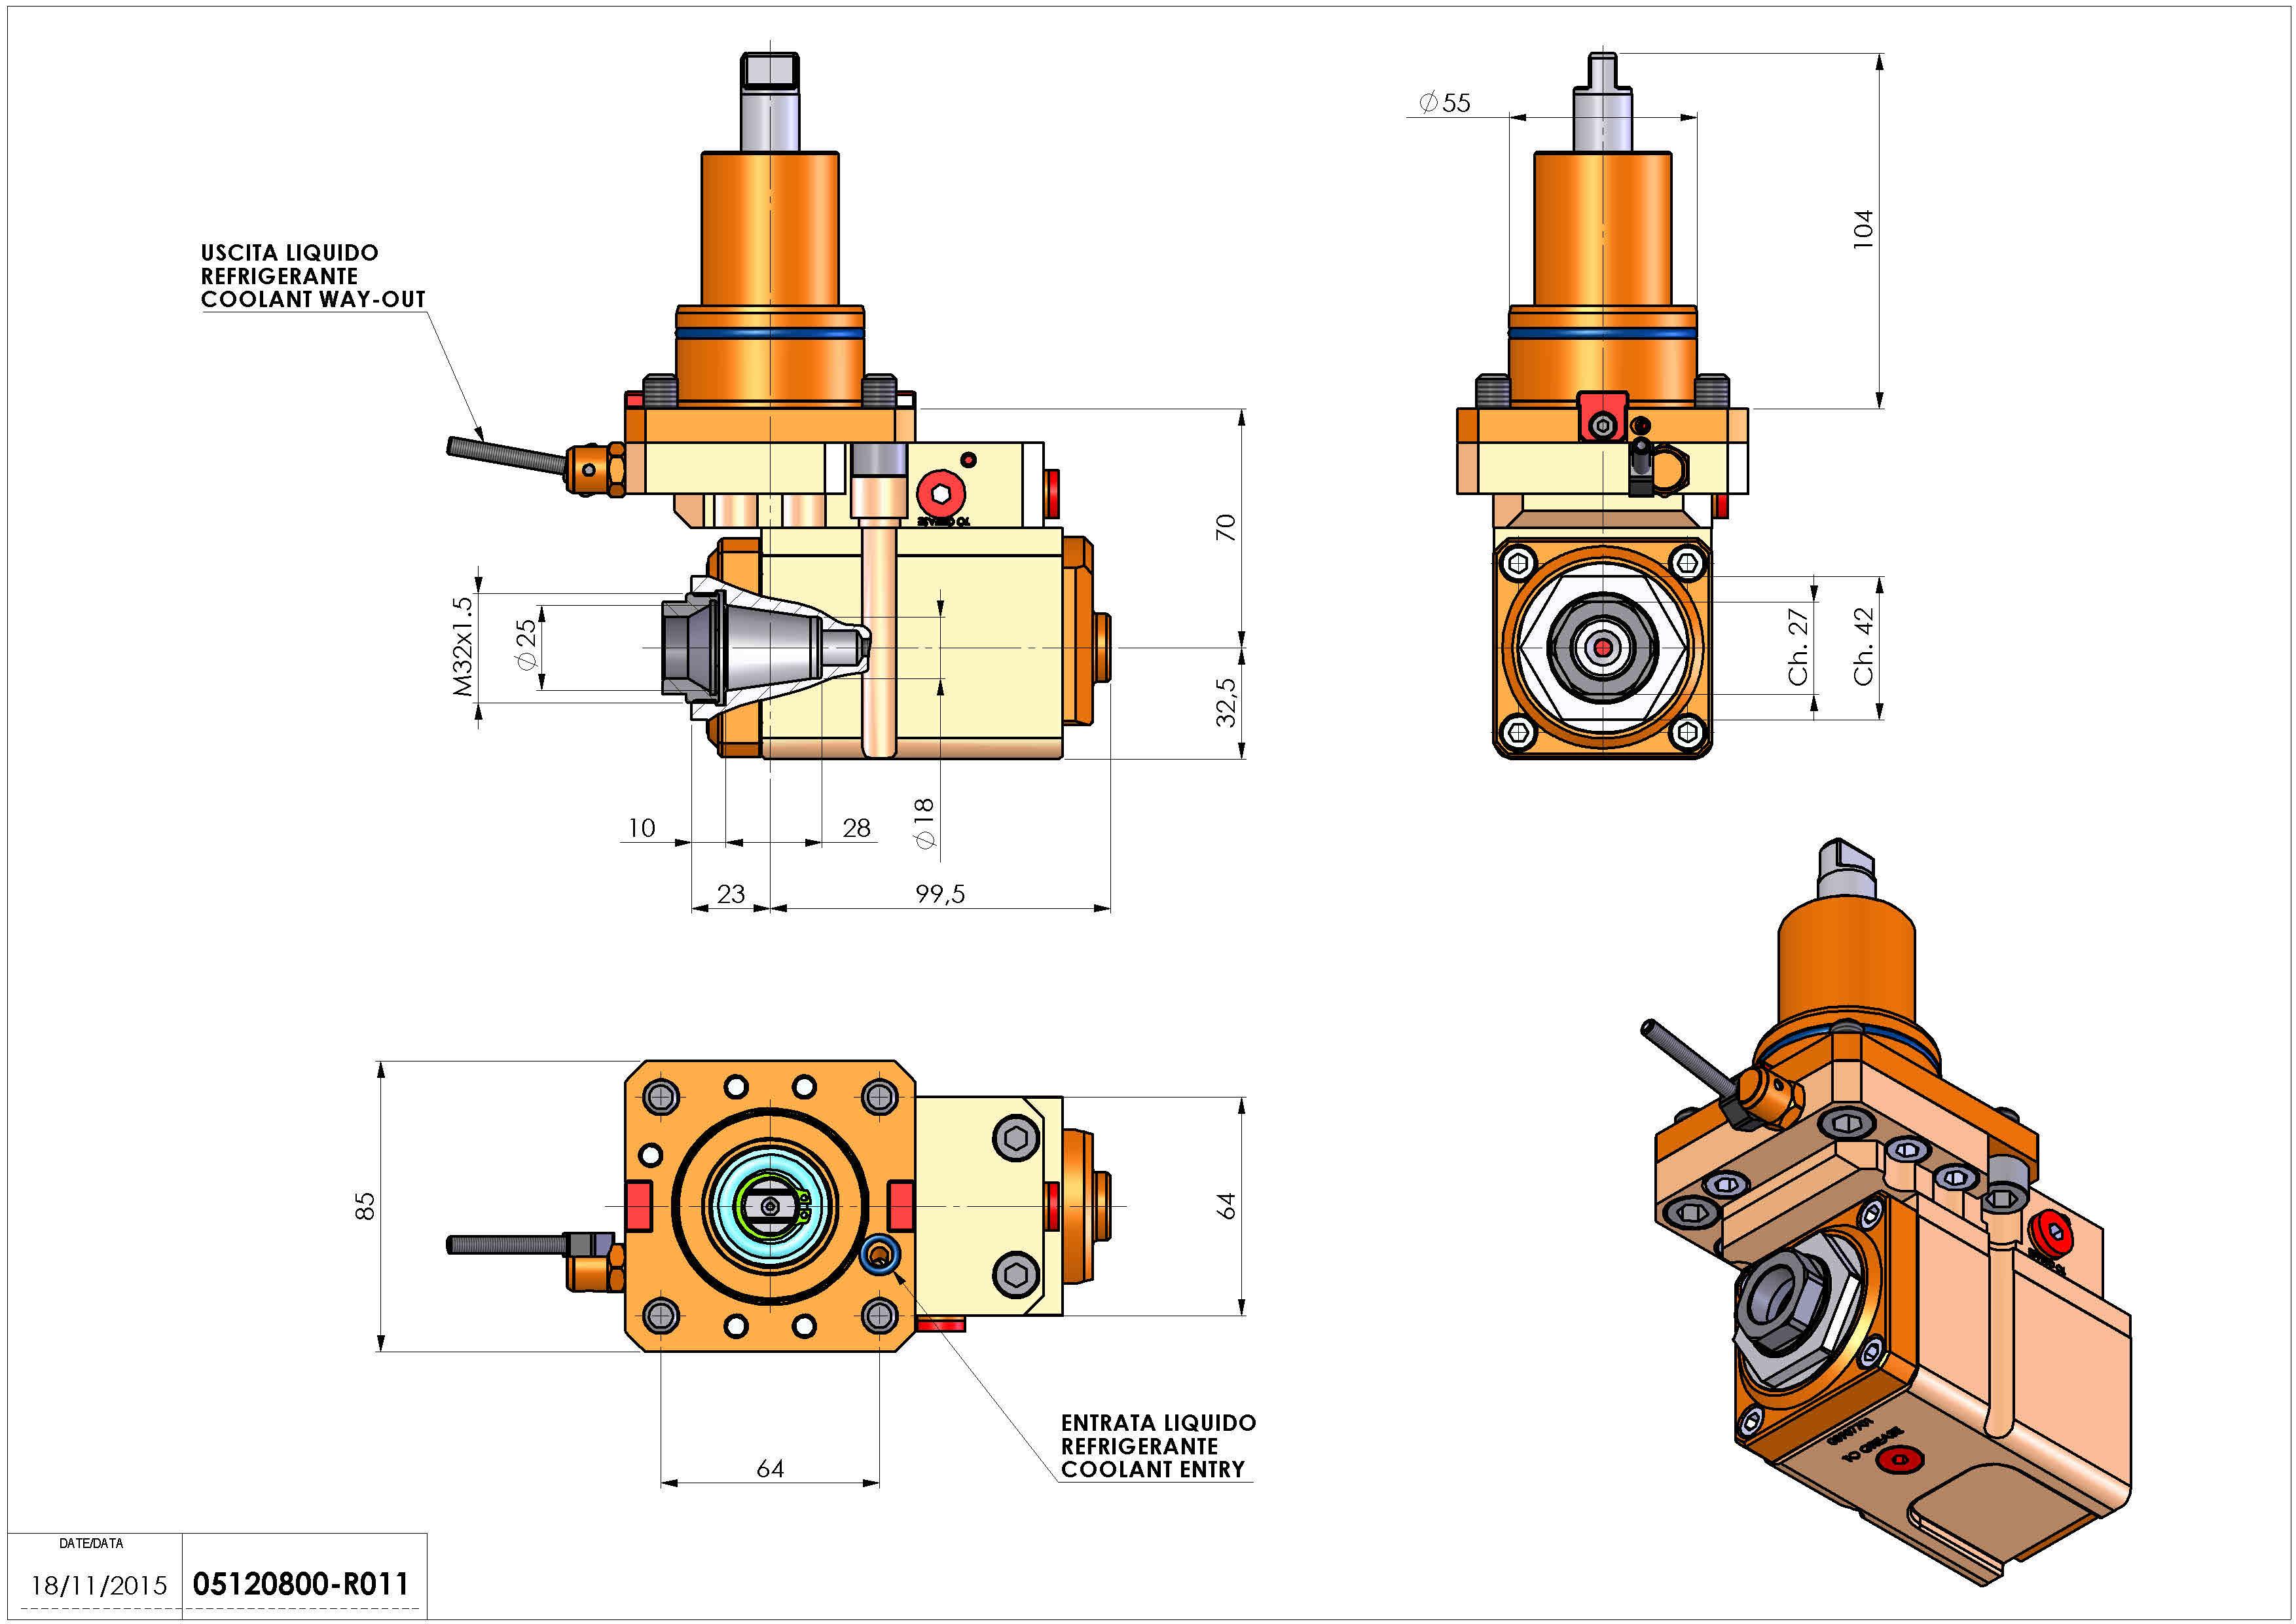 Technical image - LT-A BMT55 ER25F OFS H70 DW.